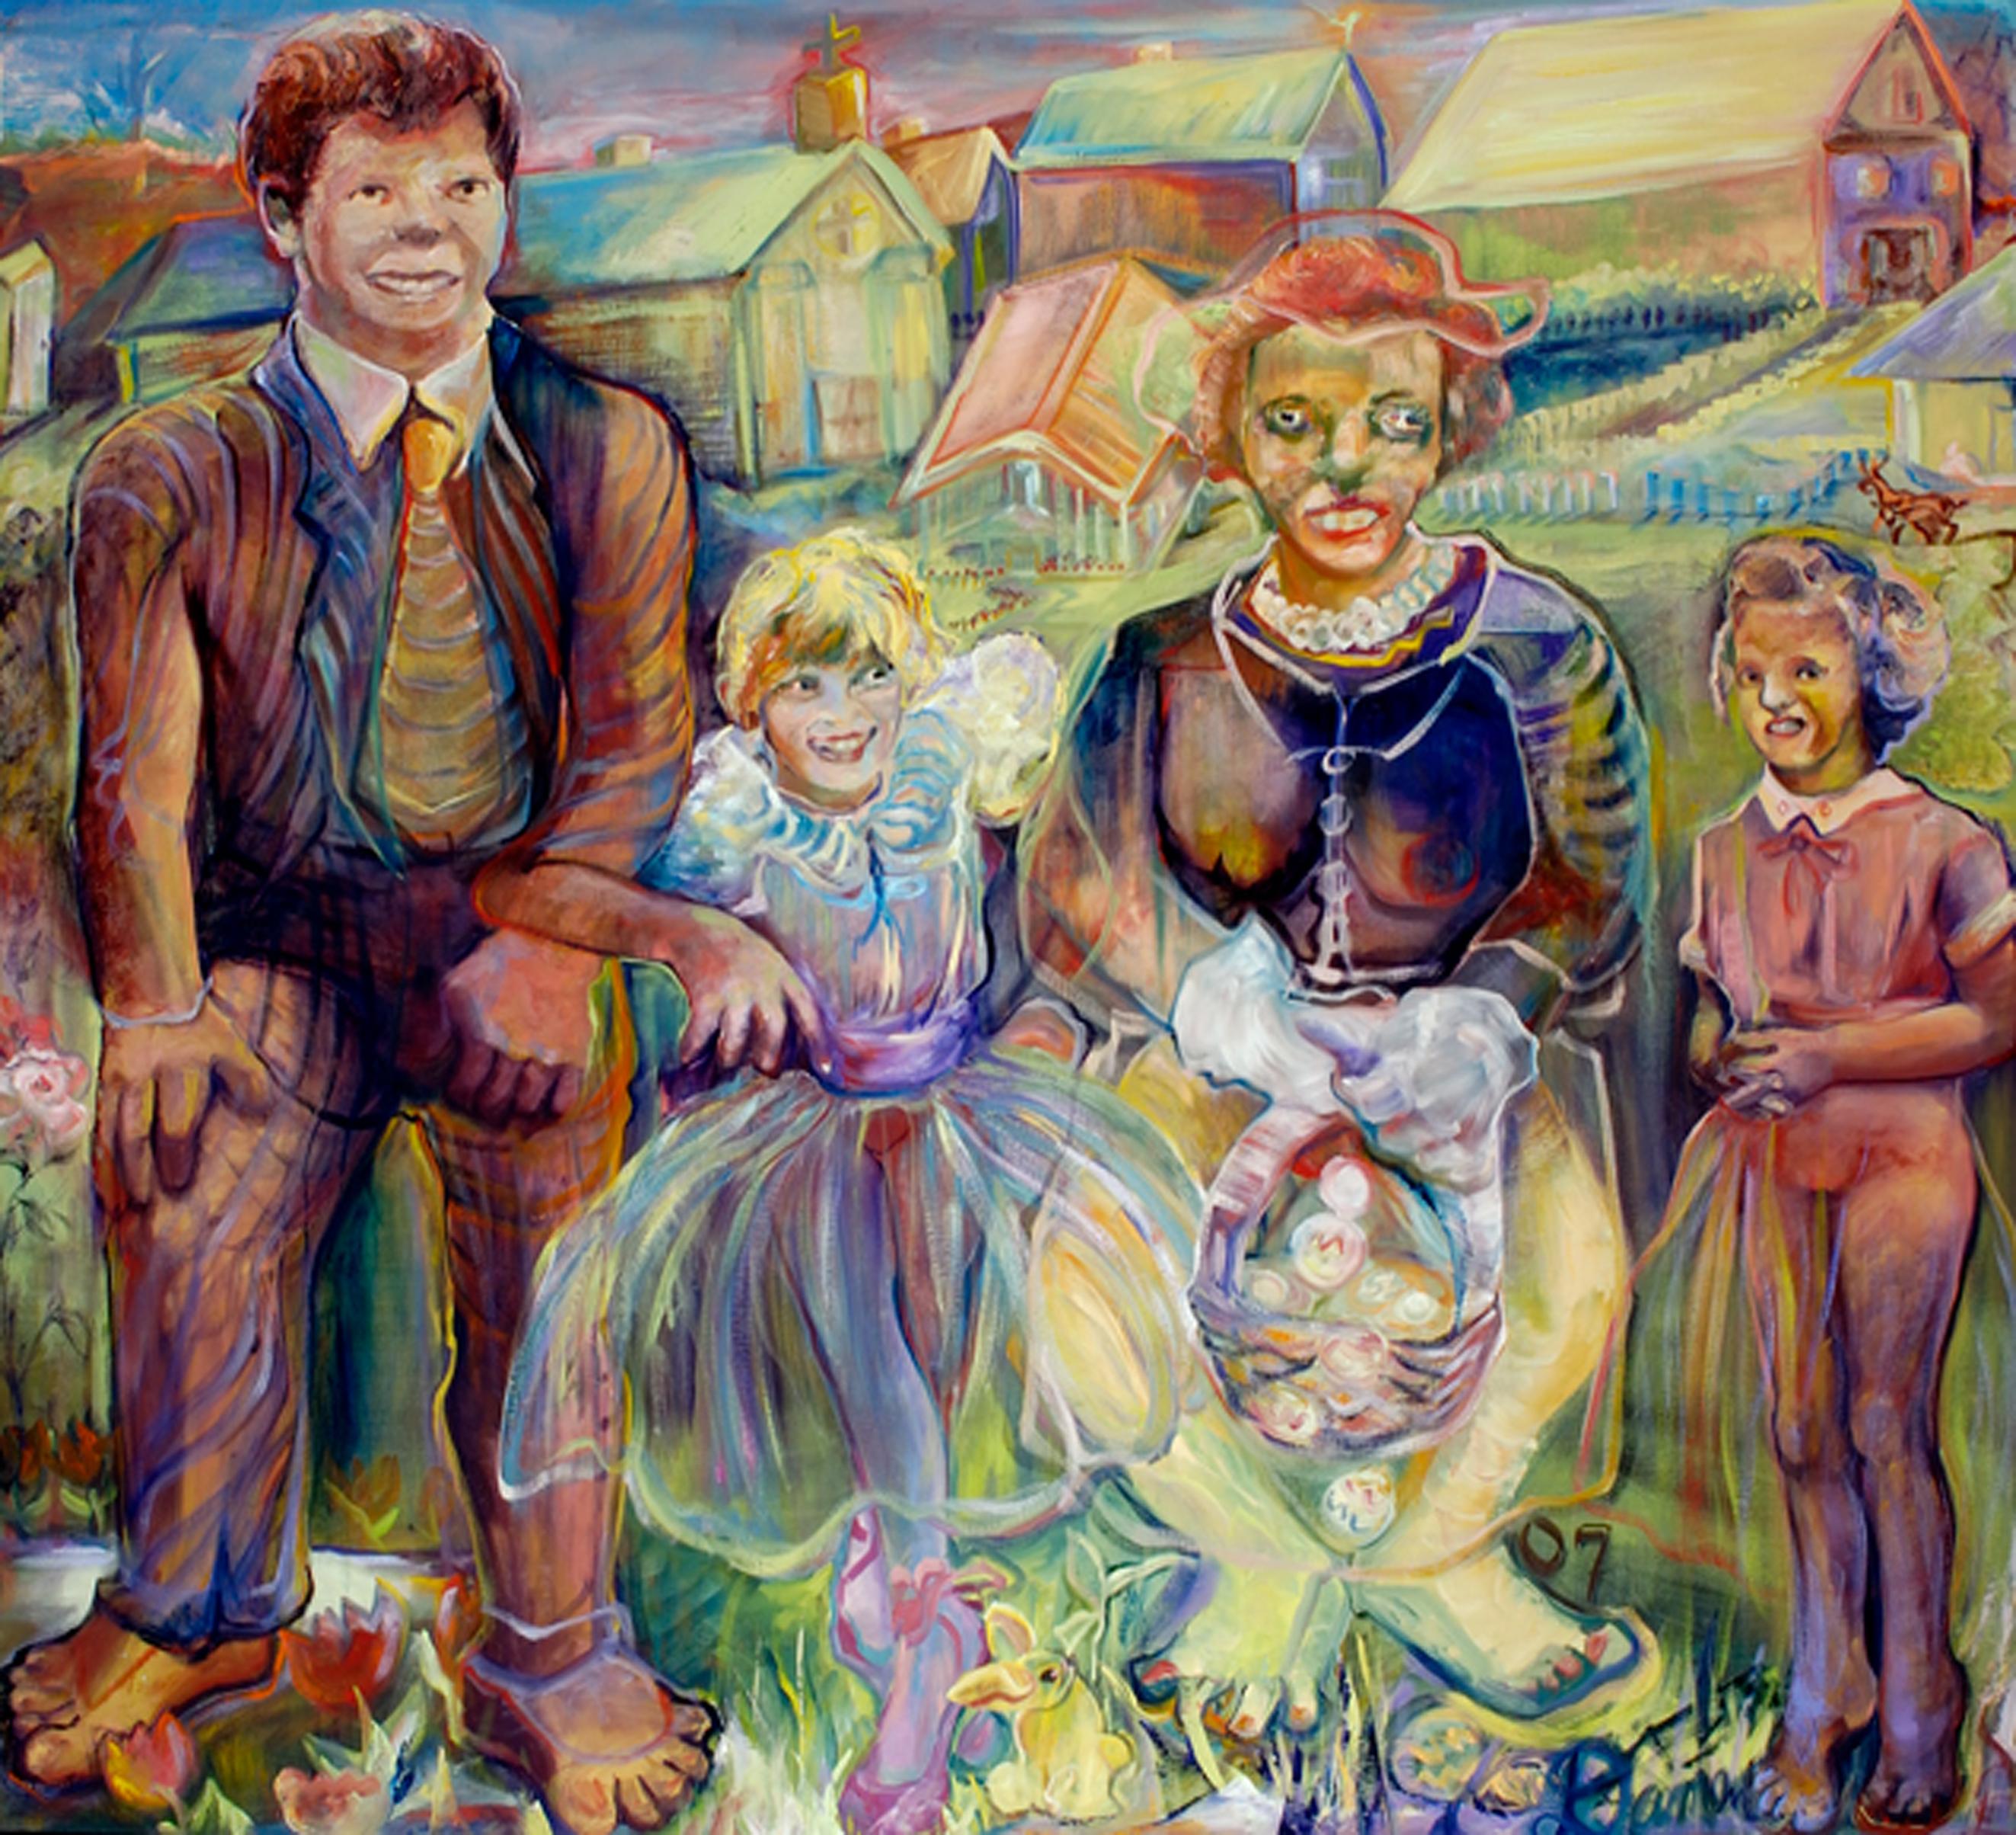 Family portrait, family facade